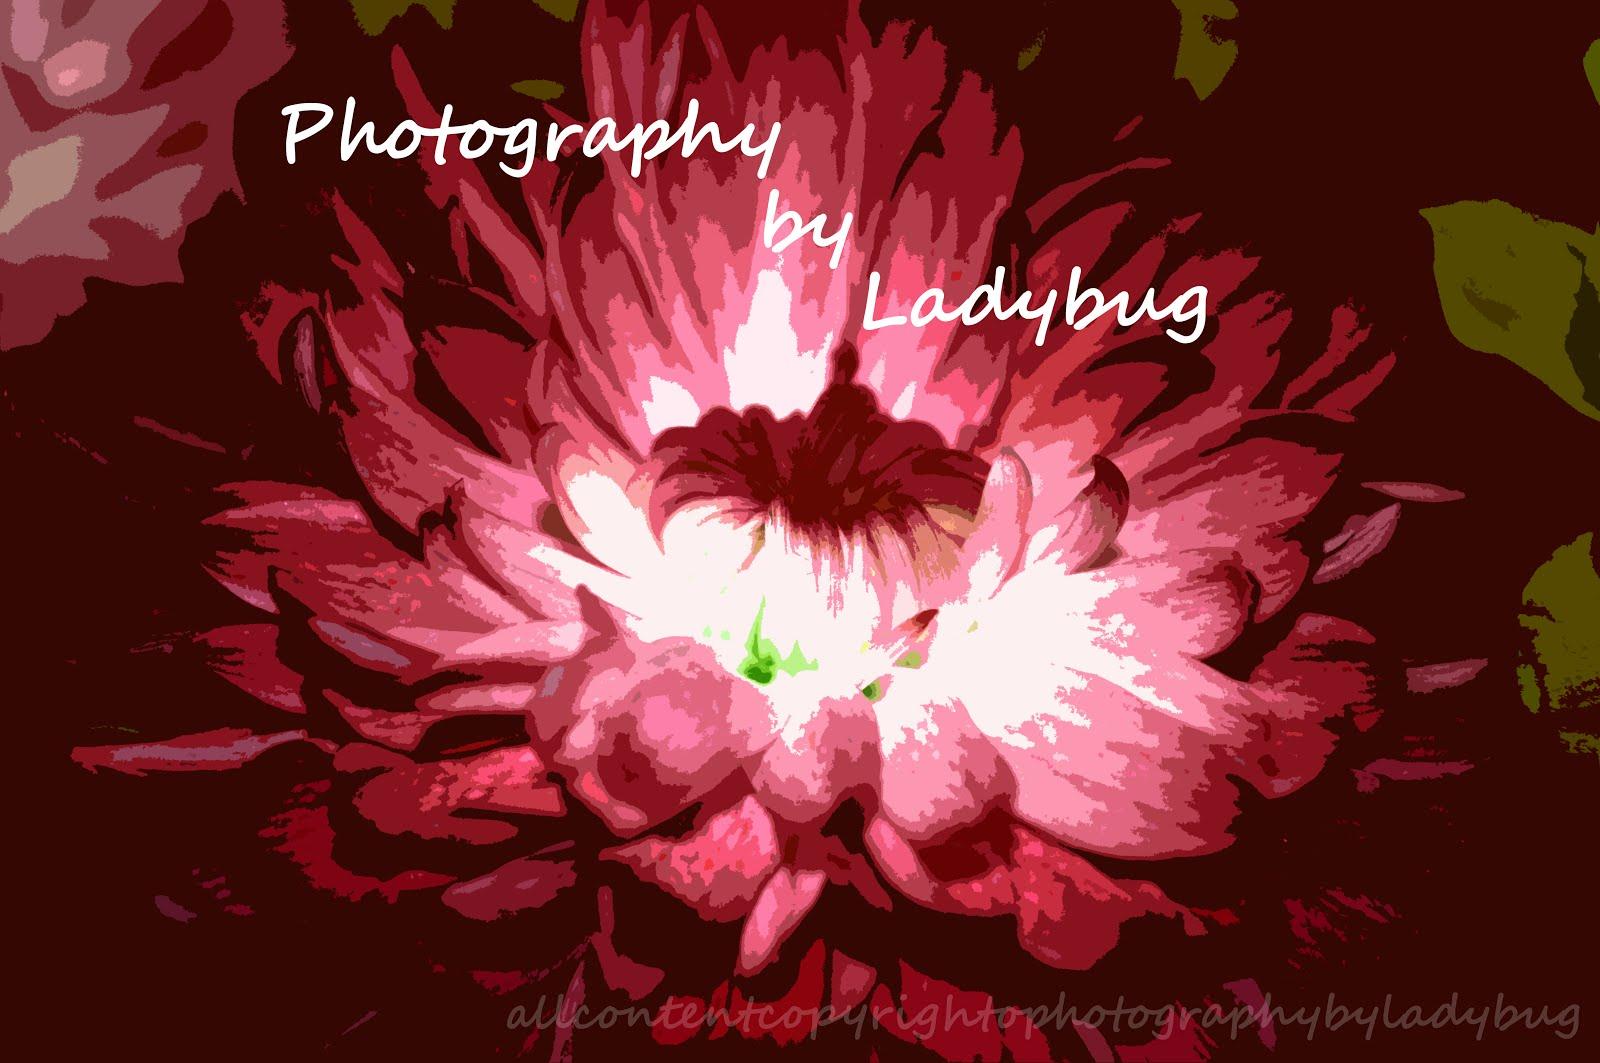 Photography by Ladybug